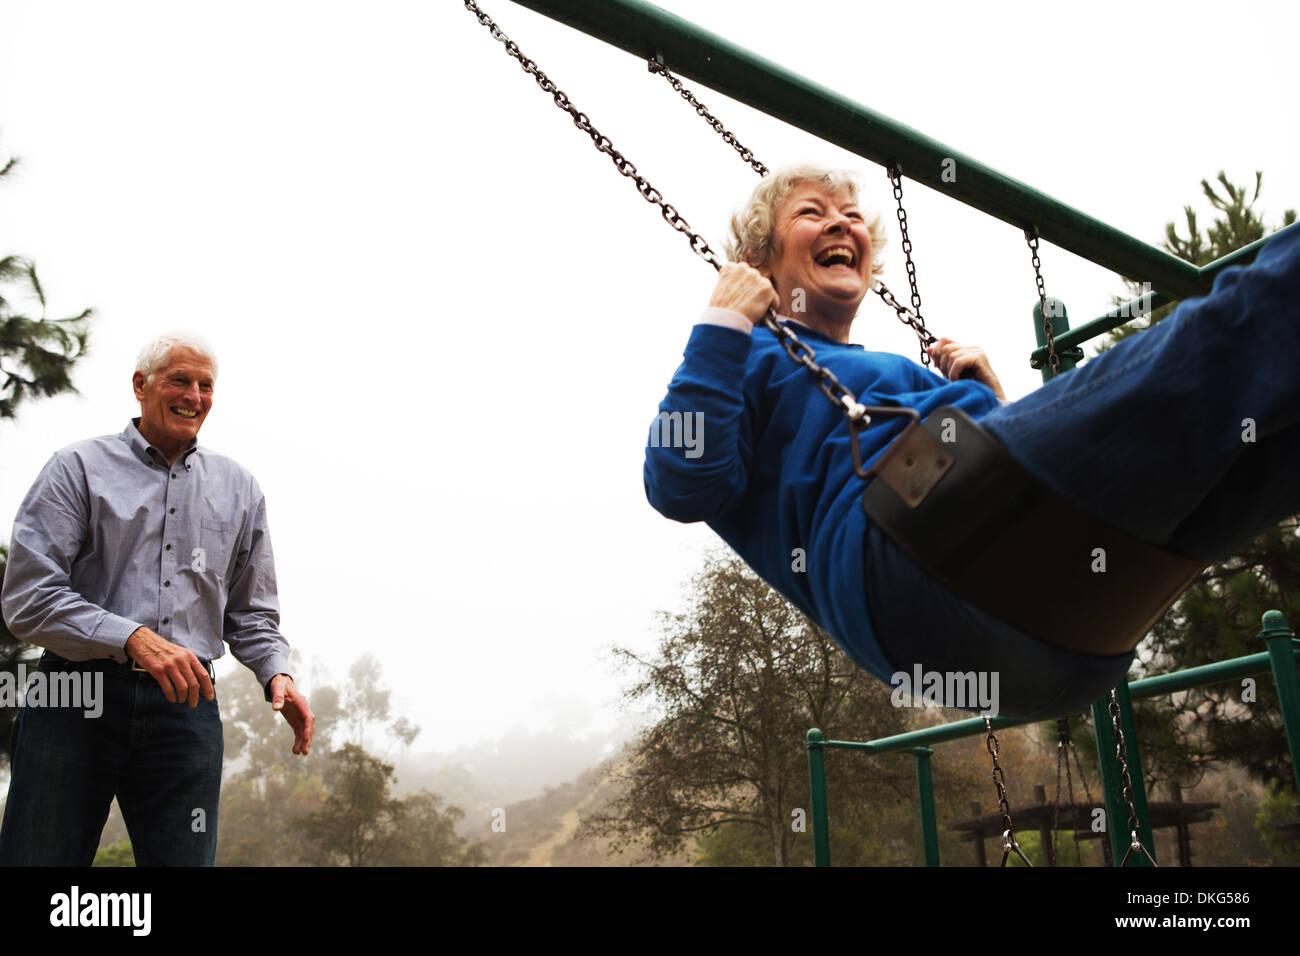 Mari Femme poussant on swing Photo Stock